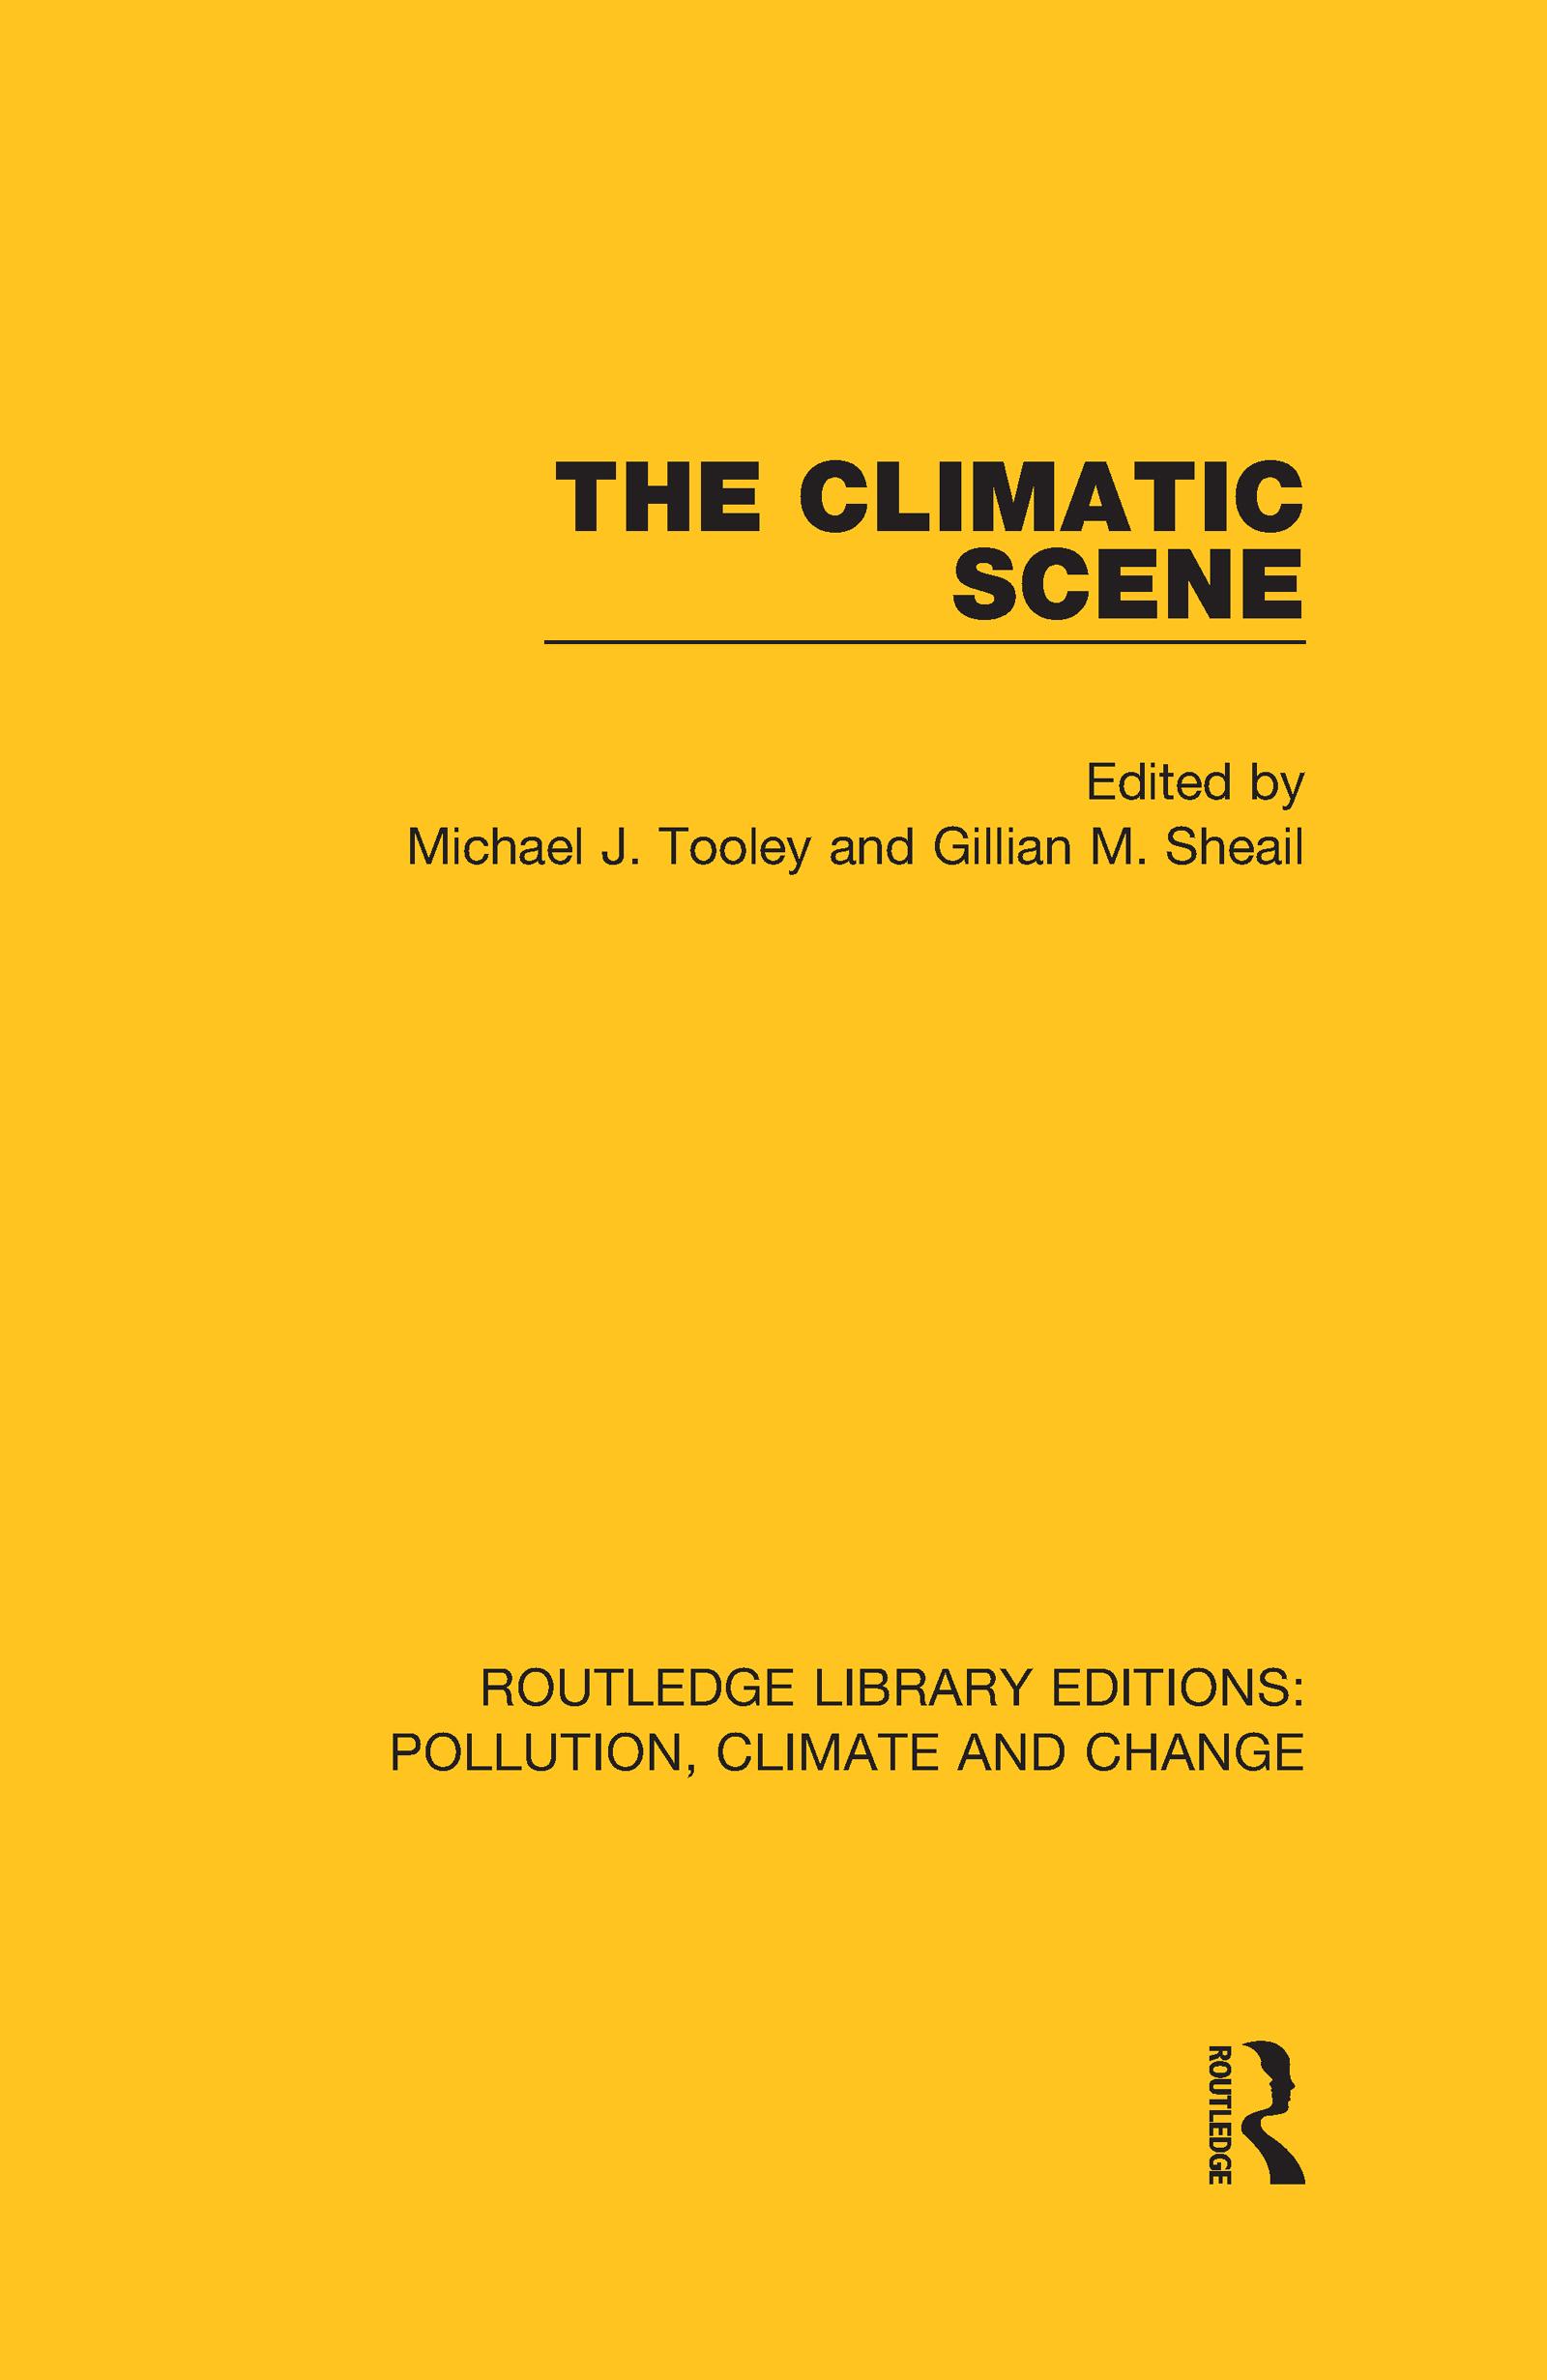 The Climatic Scene